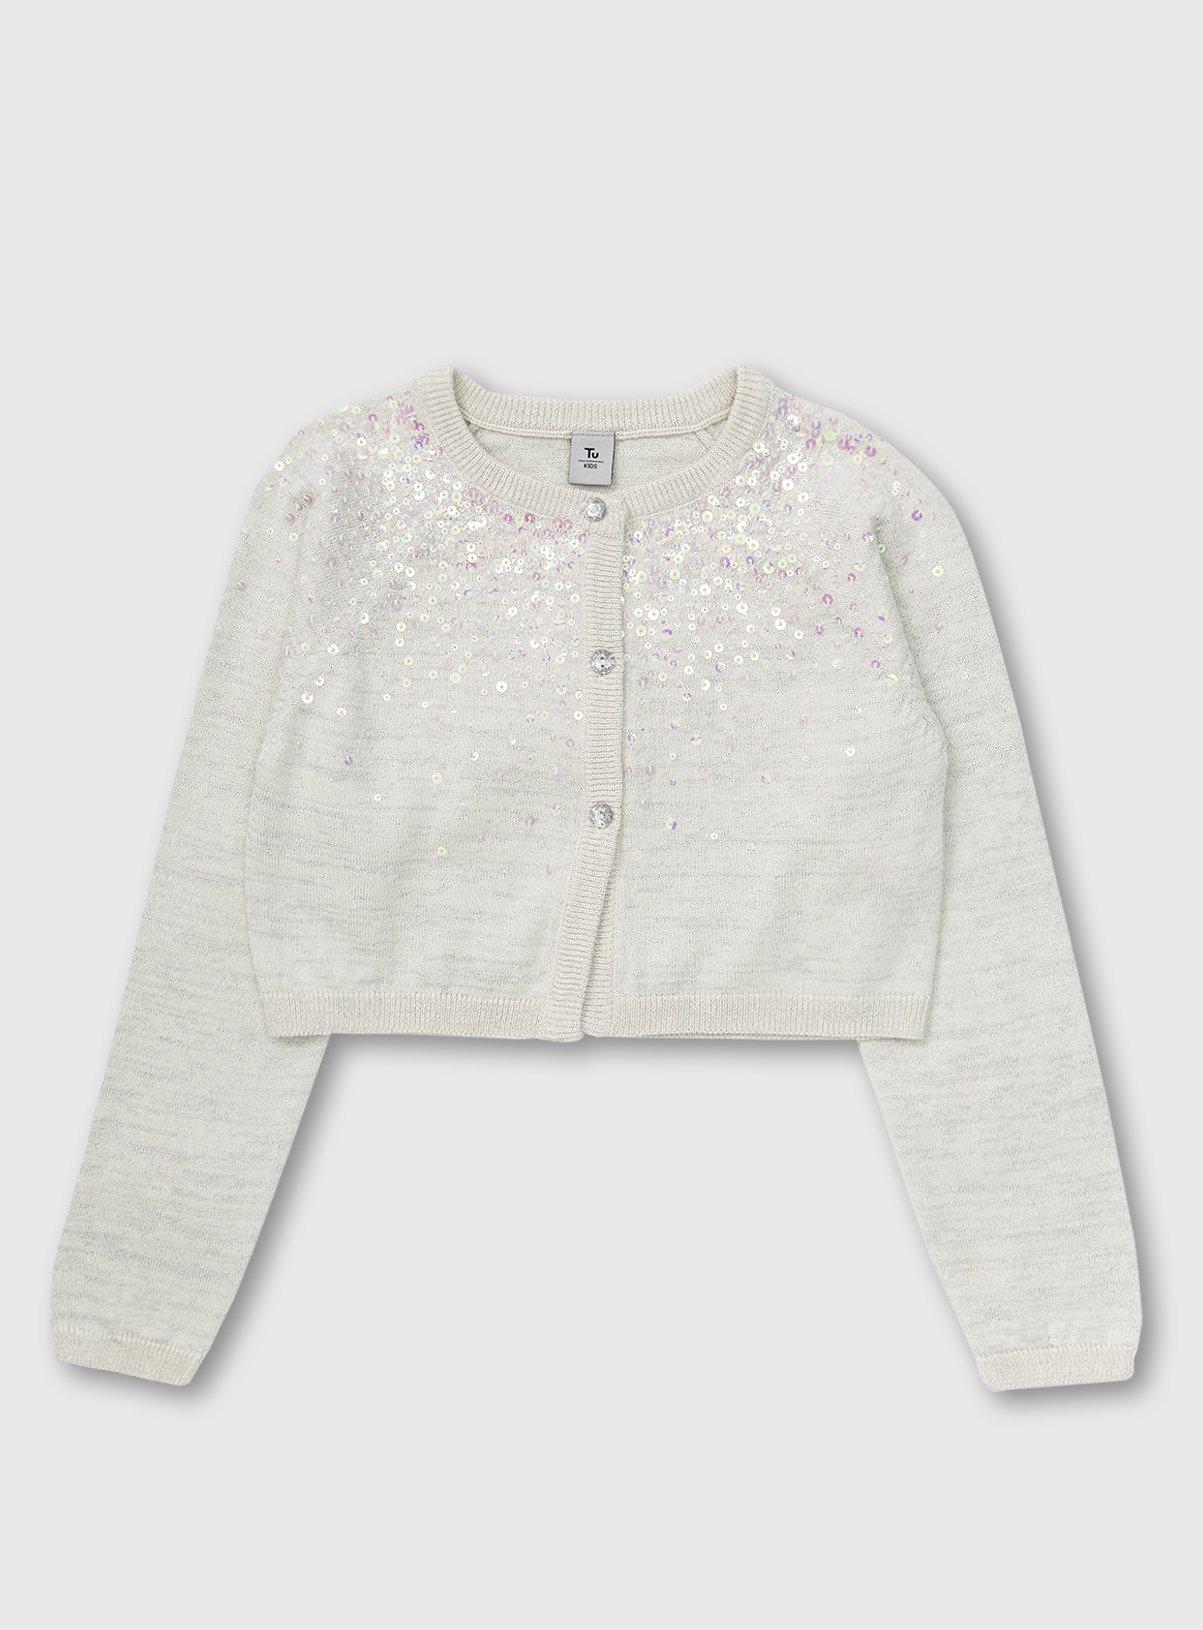 White Glitter Yoke Long Sleeve Bolero - 12 years